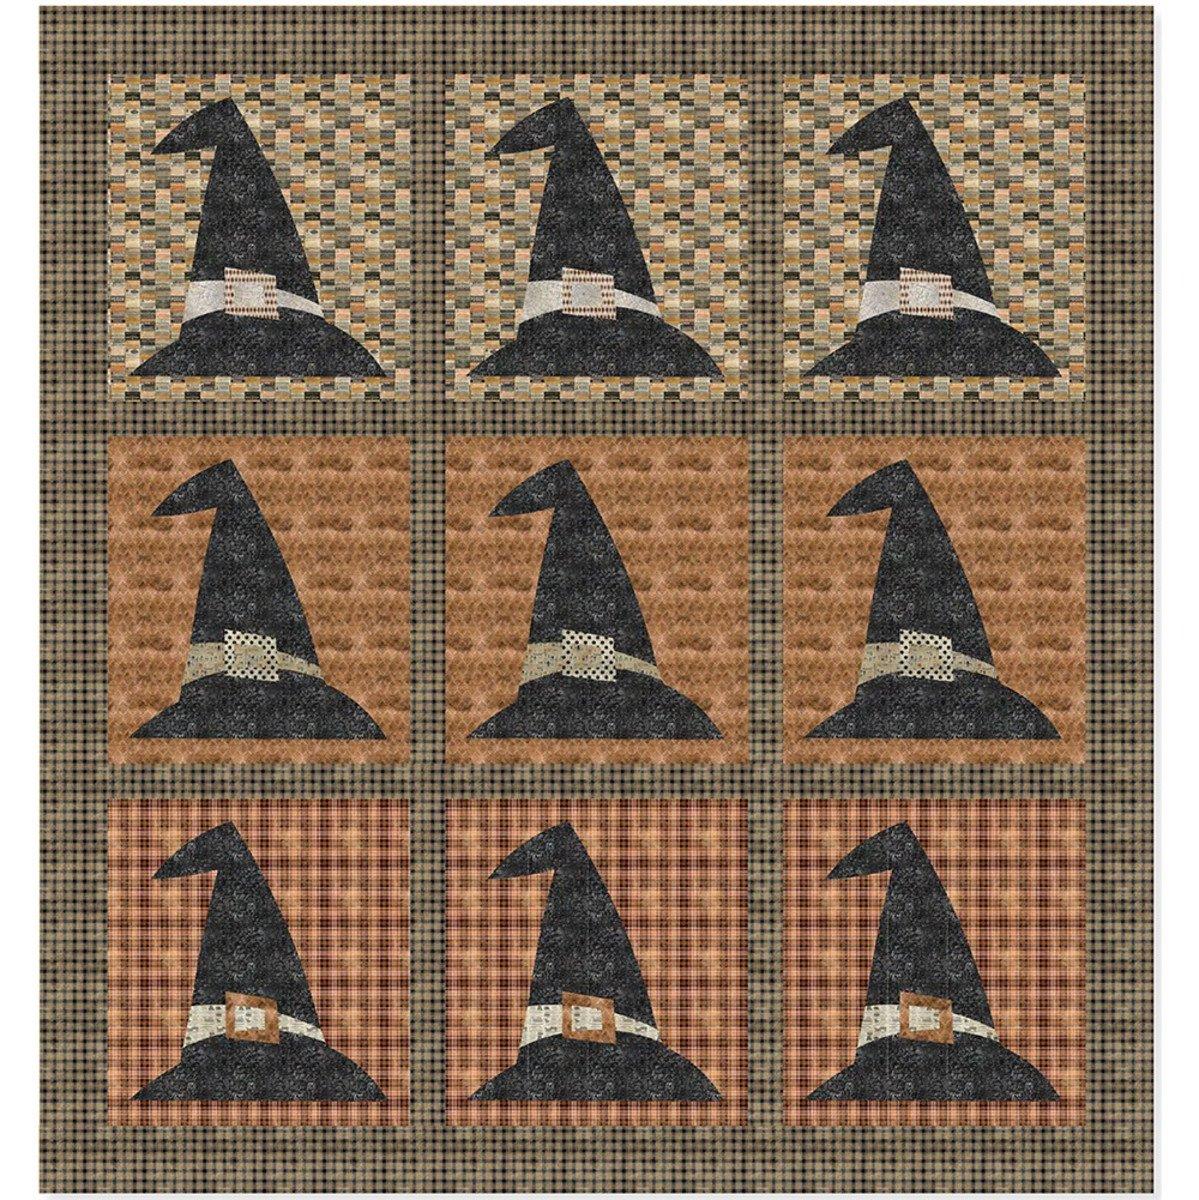 Hester's Hat Quilt Kit | Regions Beyond